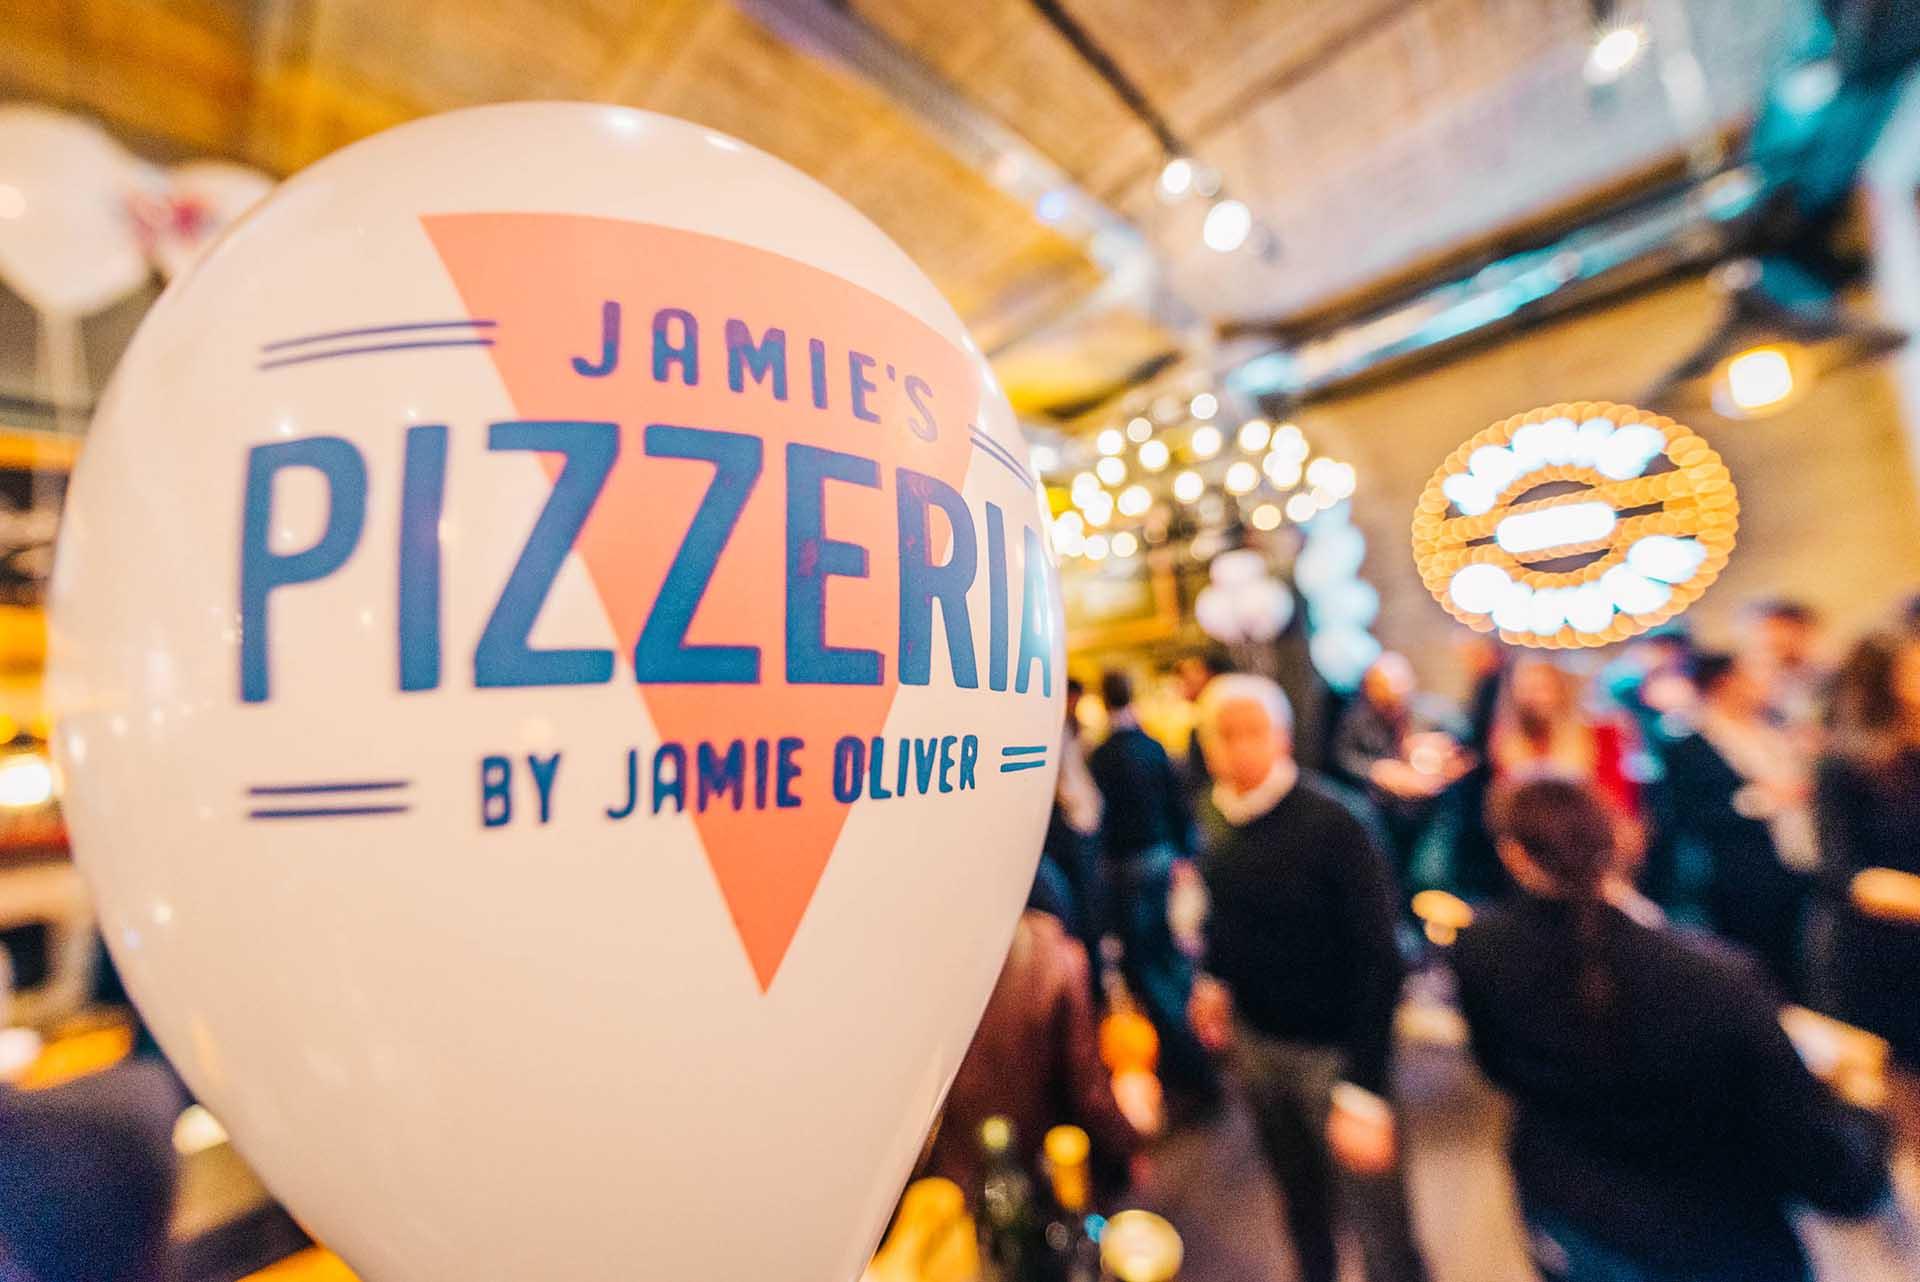 Jamie Oliver Pizzéria